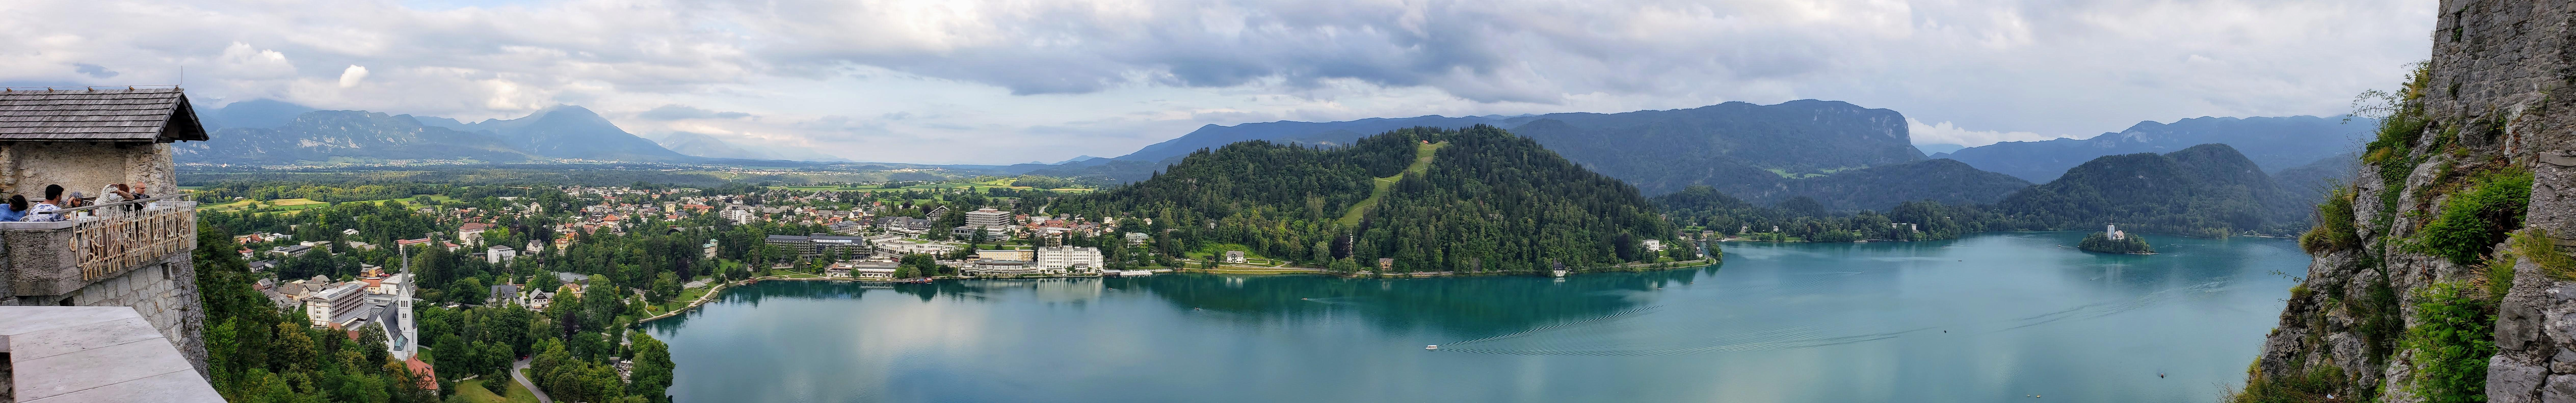 Lake Bled, Upper Carniola, Slovenia – 2 Day Trip